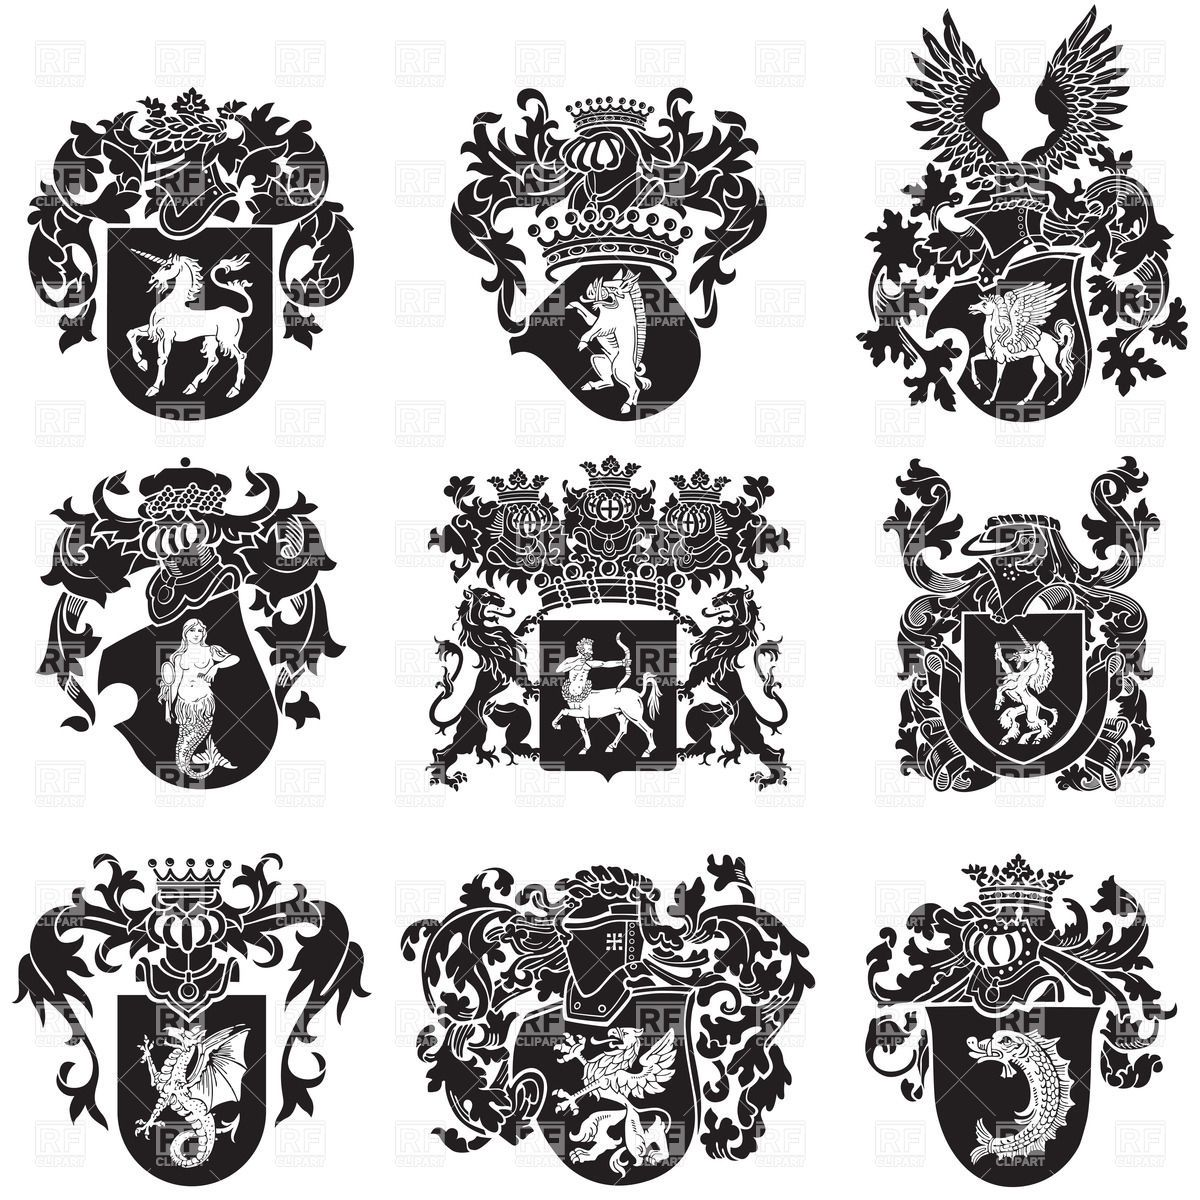 Vector image of black medieval heraldic emblems 21622 includes vector image of black medieval heraldic emblems 21622 includes graphic collections of coat of arms biocorpaavc Gallery